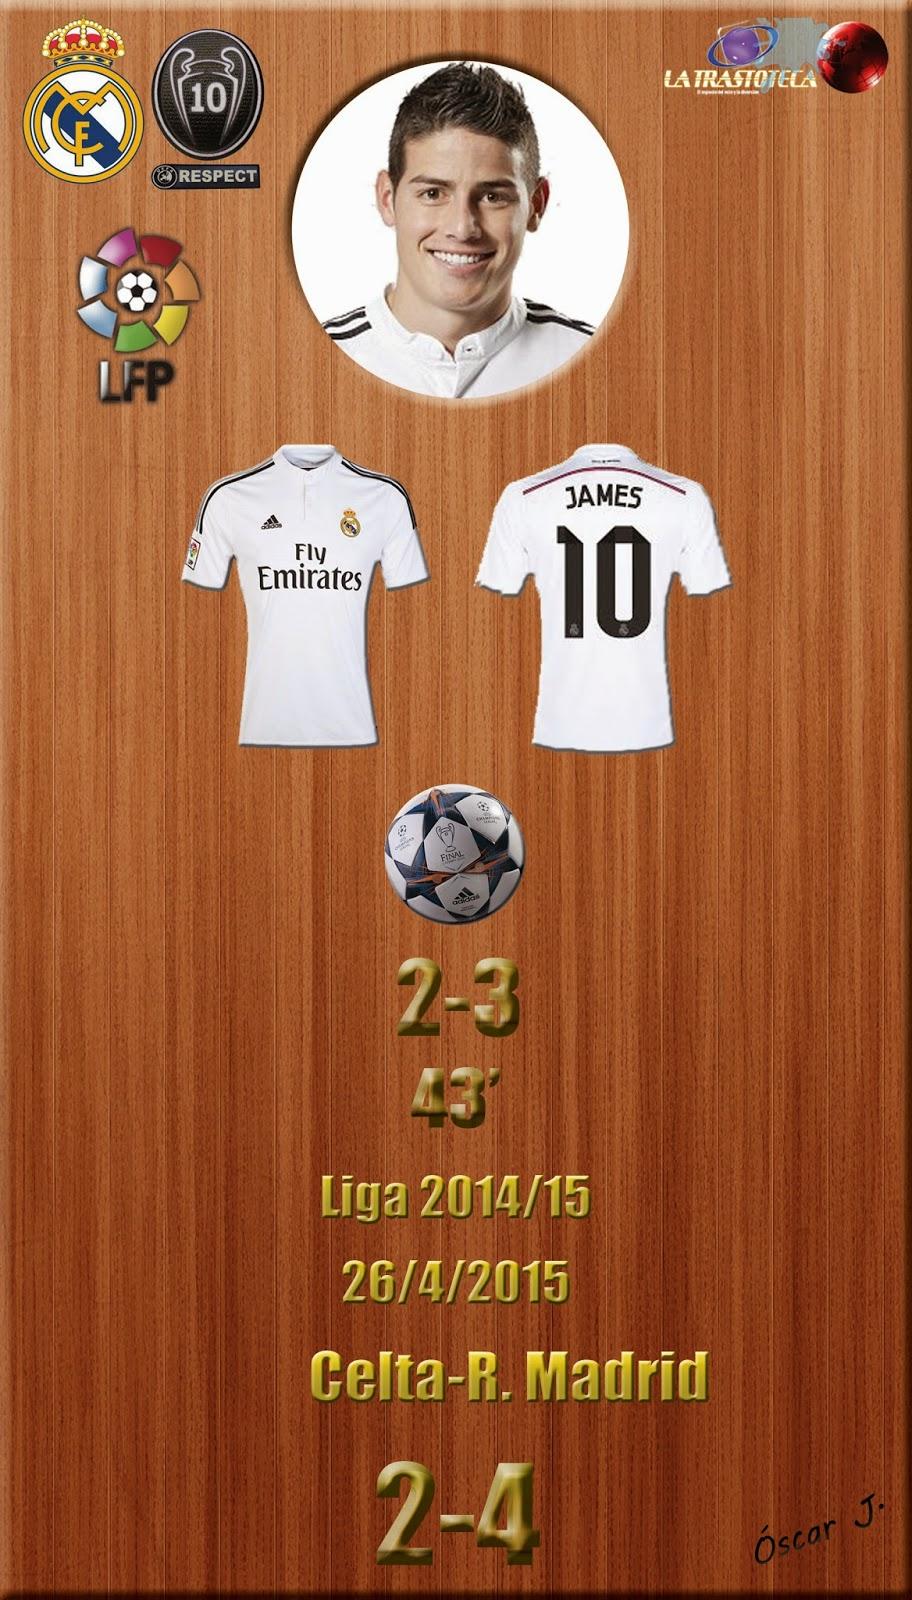 Celta 2-4 Real Madrid - Liga 2014/15 - Jornada 33 - (26/4/2015)